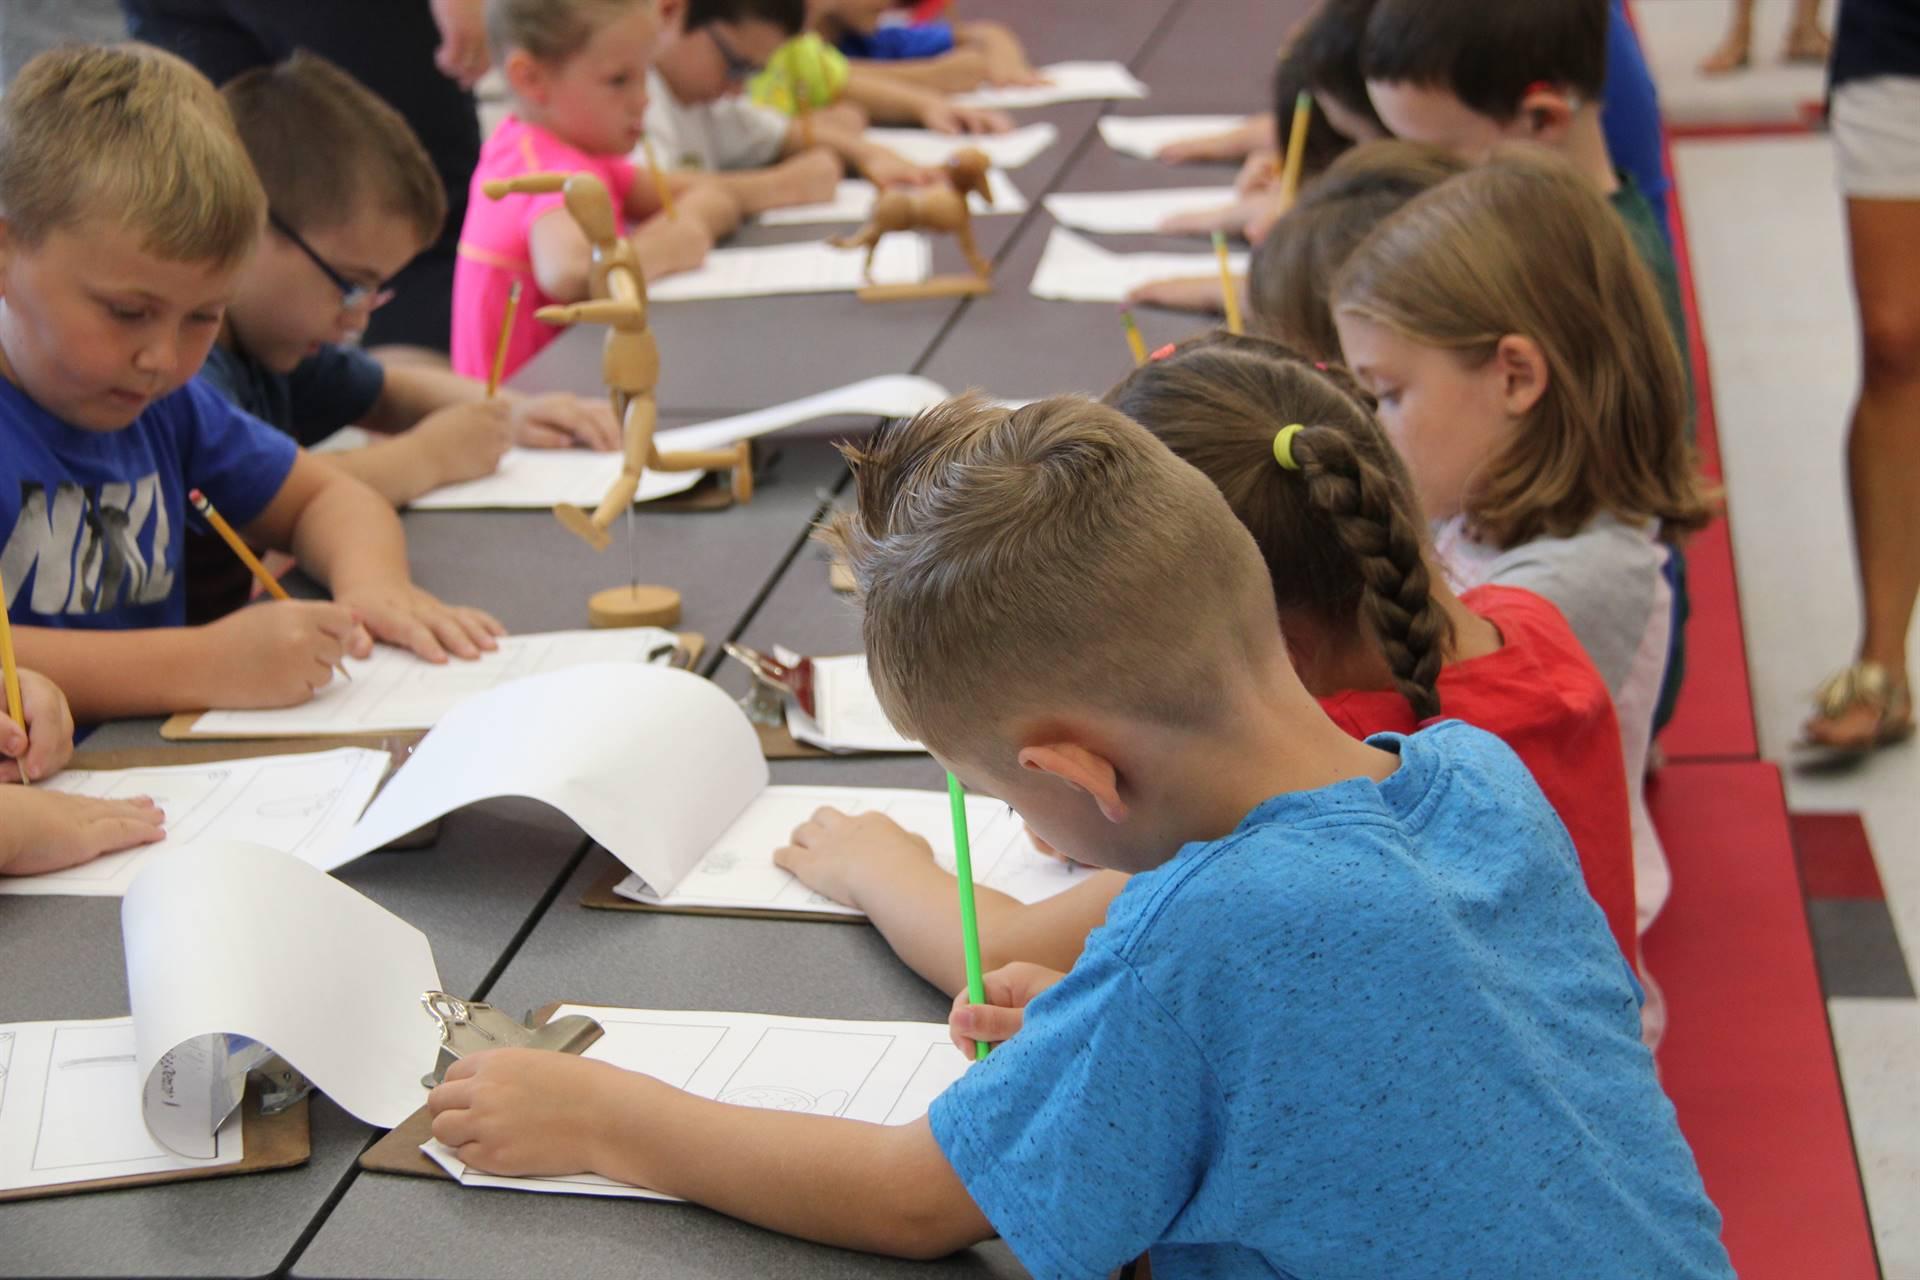 students sketch wooden figure